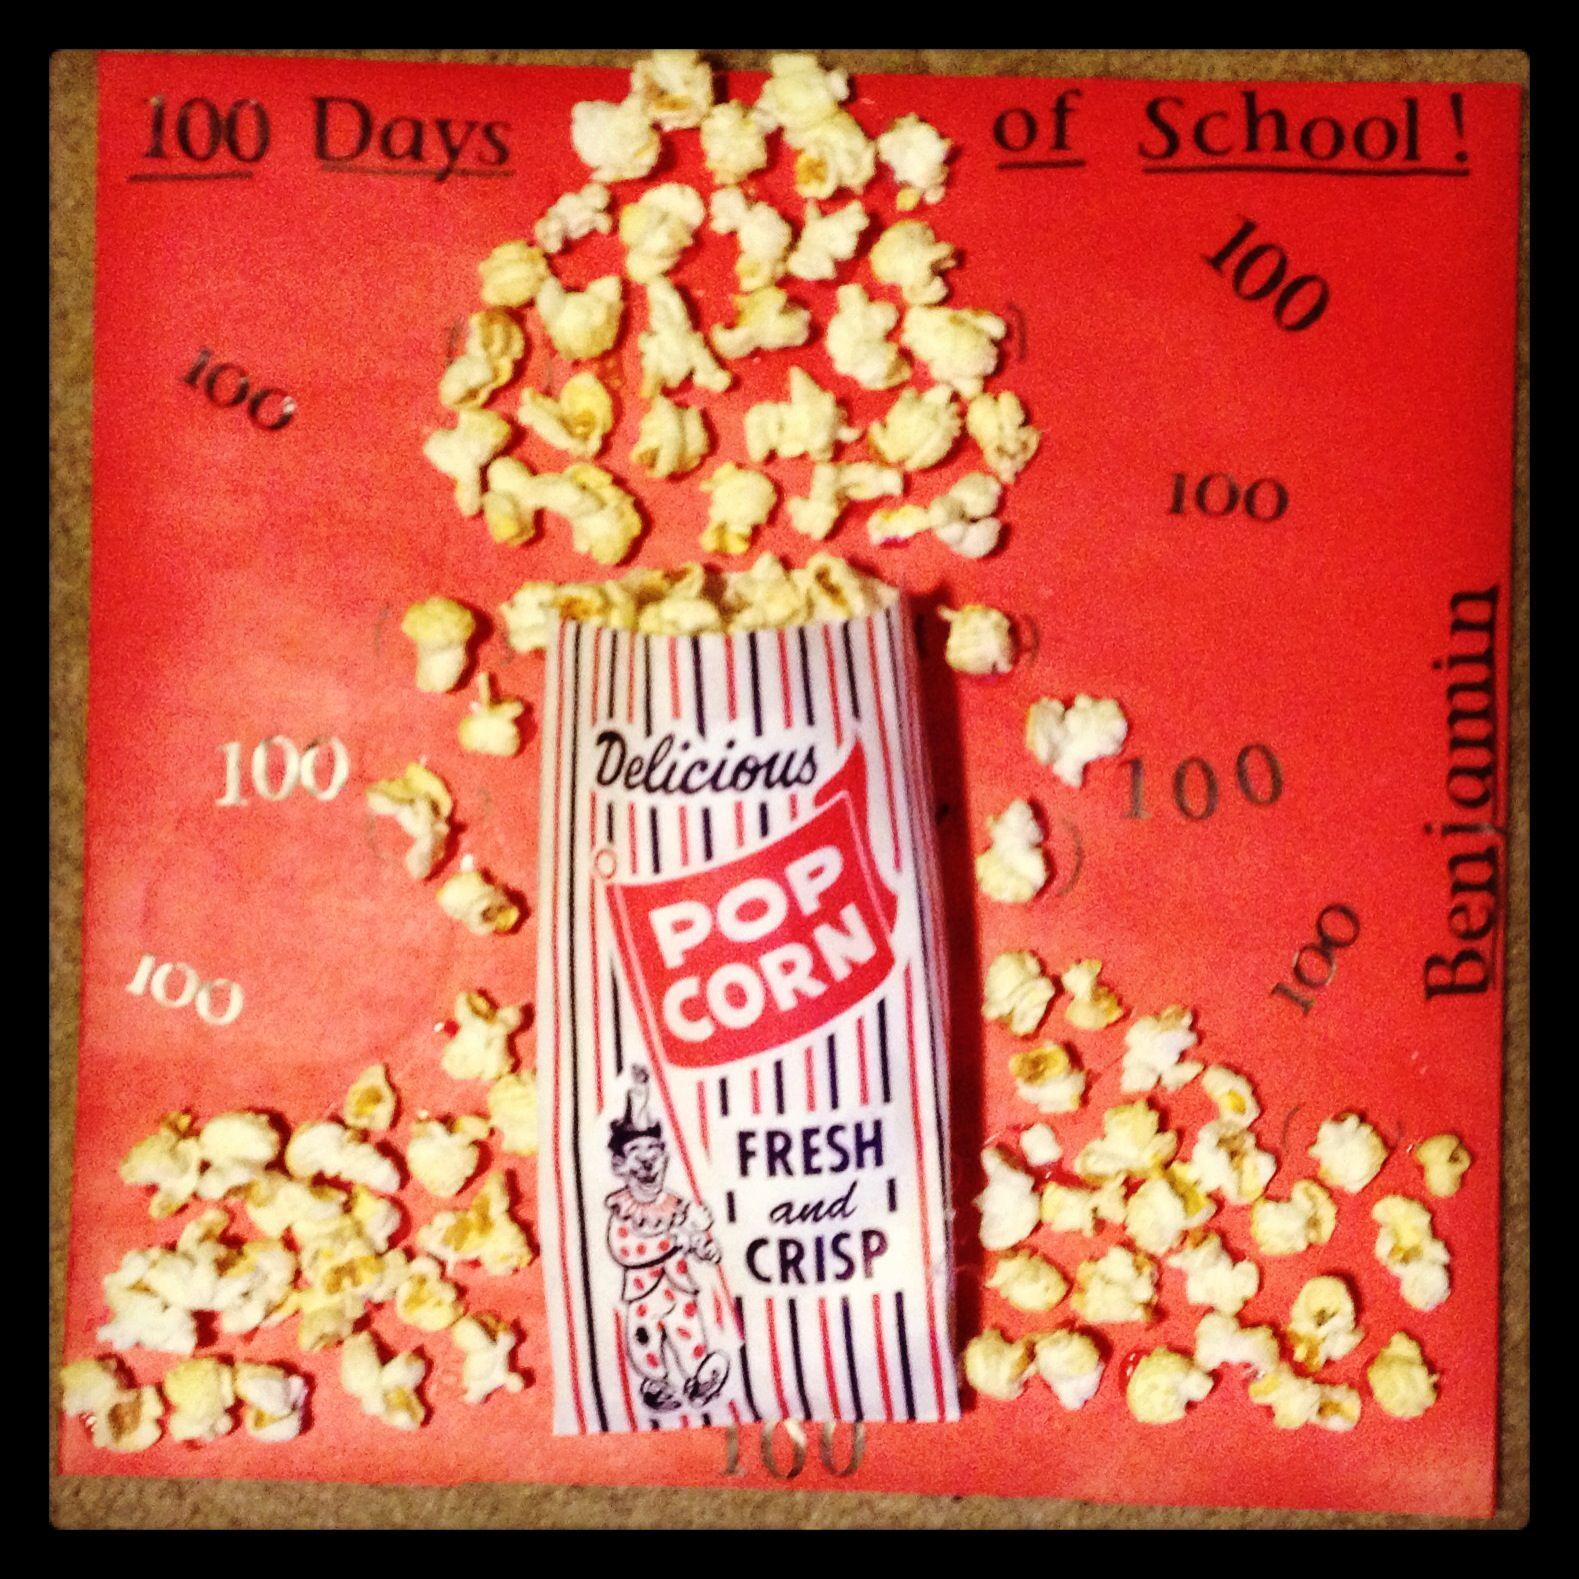 c813152f0 100 days of school project. 100 pieces of popped corn. 3D popcorn bag look.  #100daysofschool #popcornposter